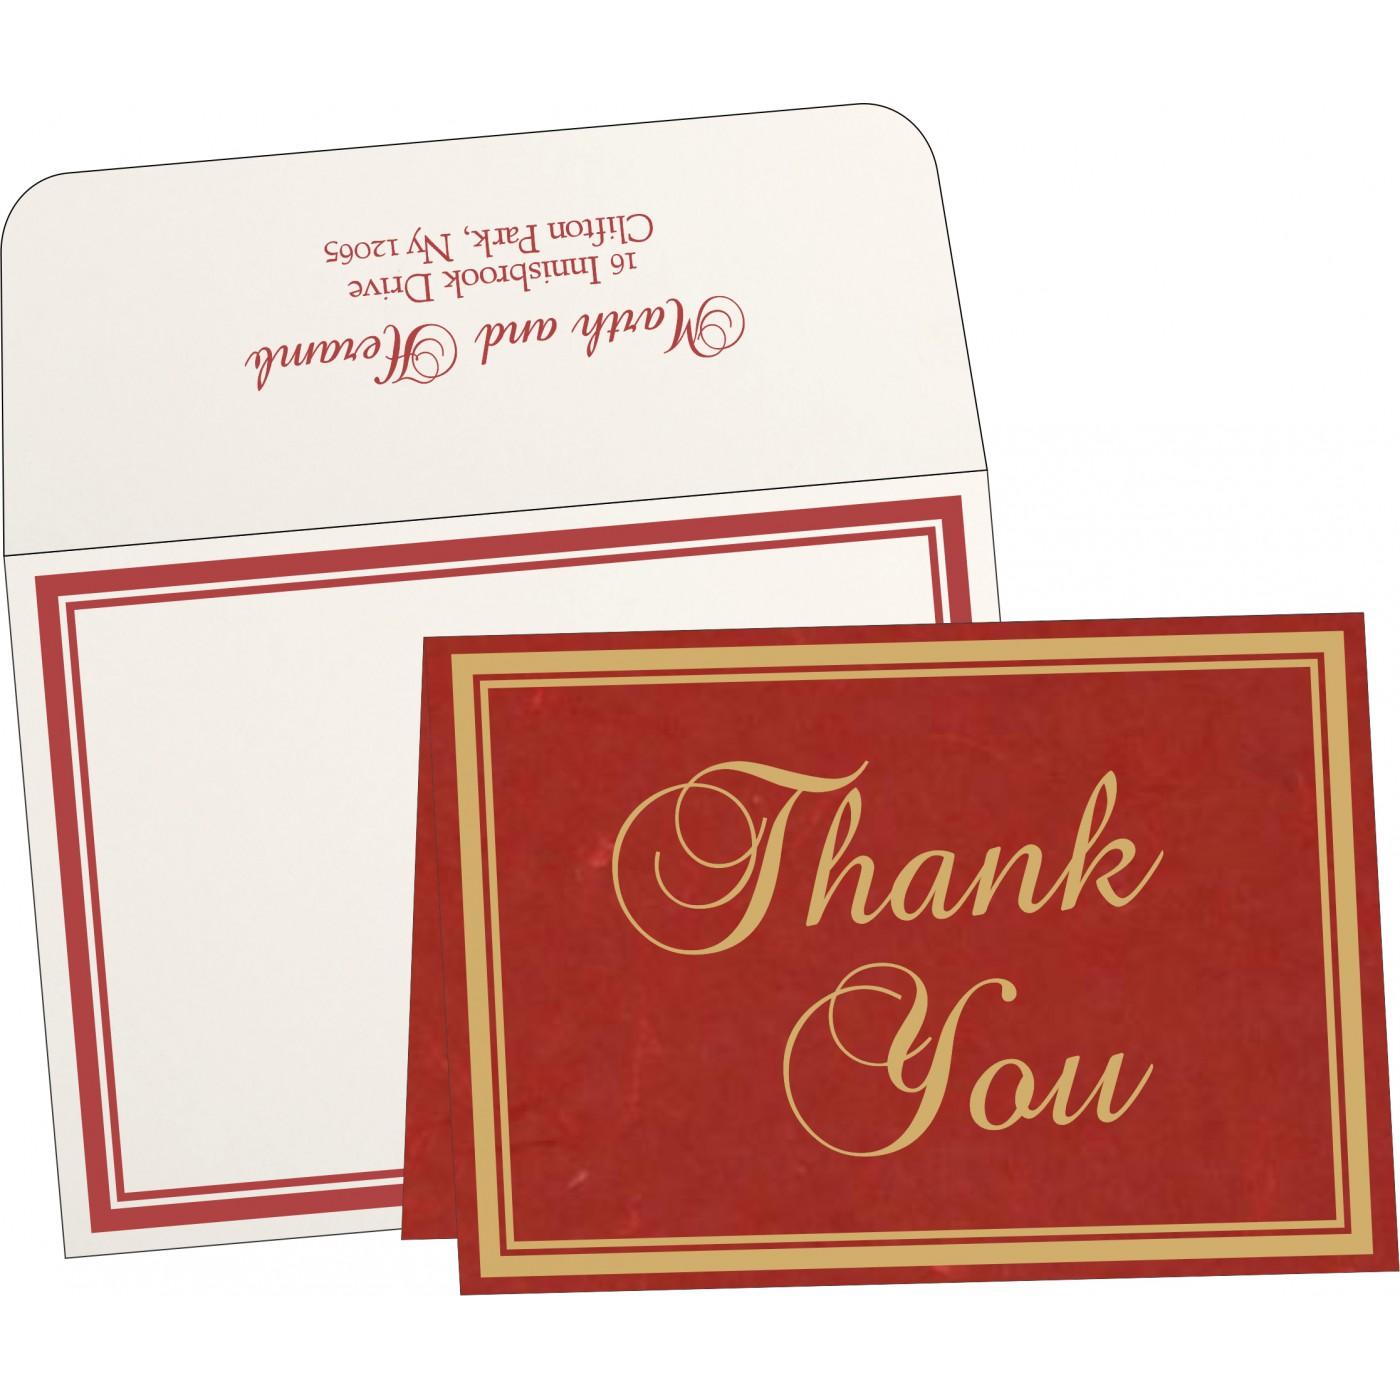 Thank You Cards : TYC-8203C - 123WeddingCards